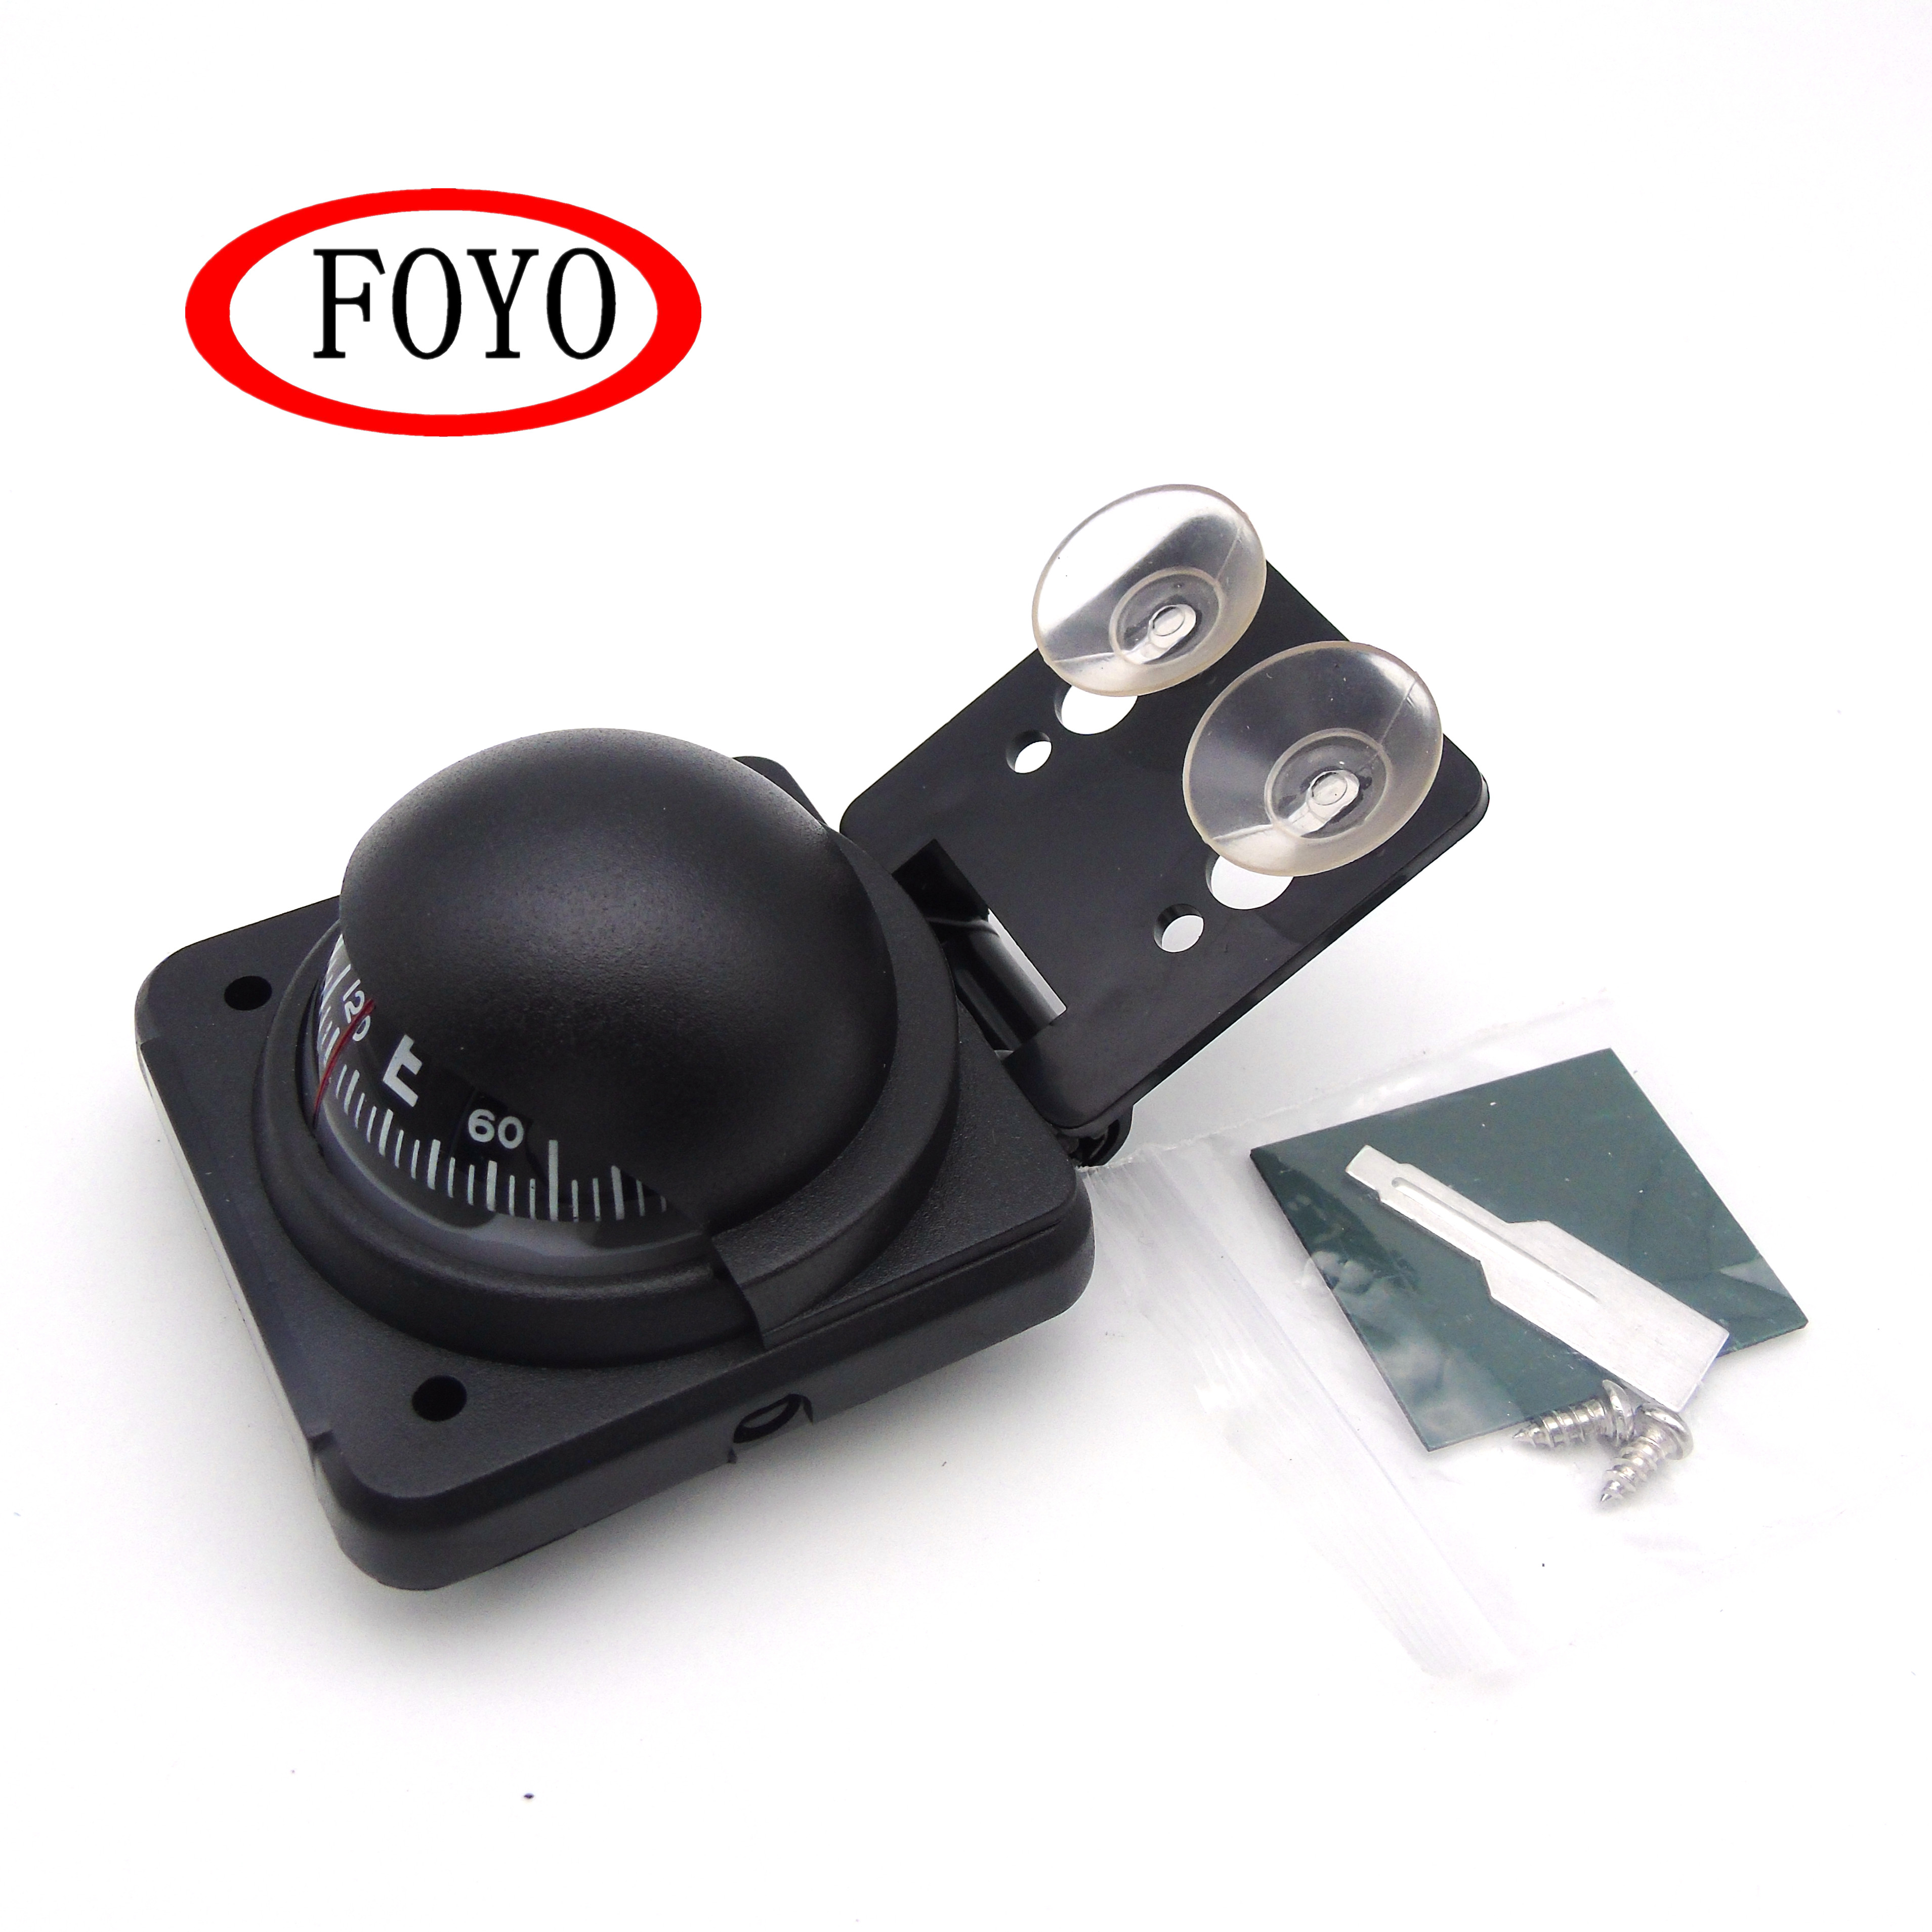 FOYO Brand Highest Quality Survival Gear Compass Marine compass Flexible Navigation Navigation Magnetic Compass